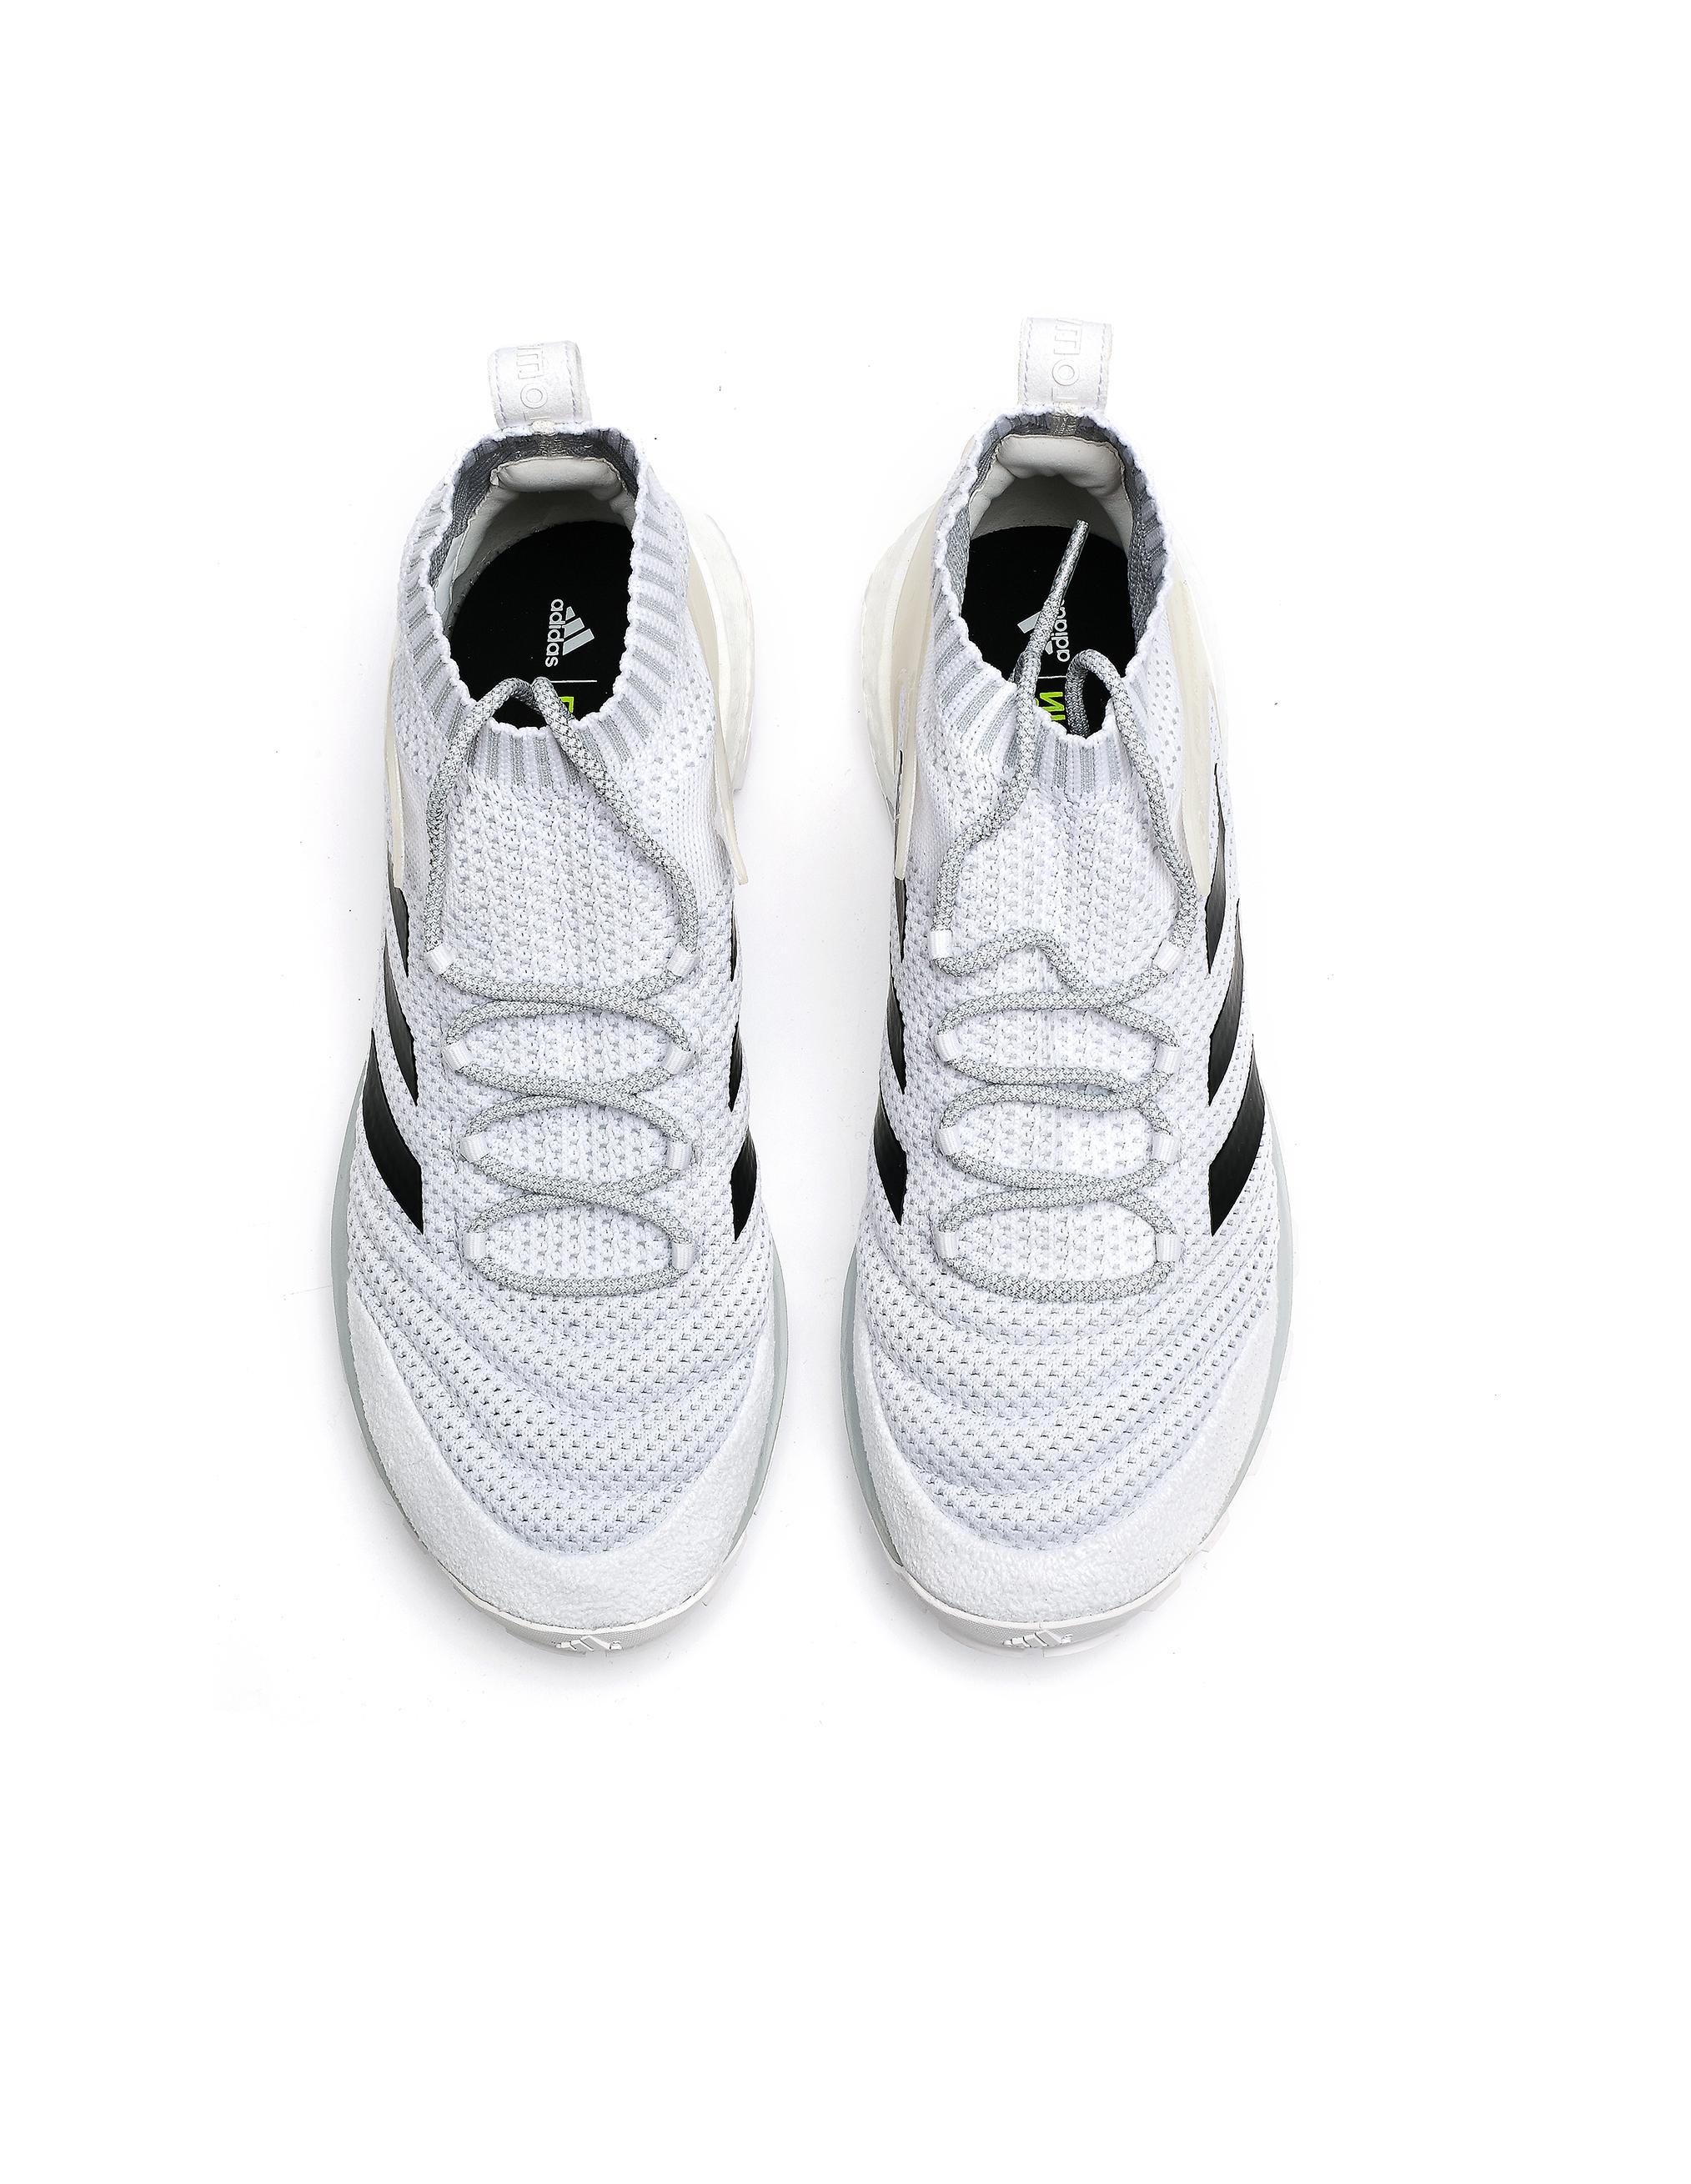 meet 370cd 636fd Lyst - Gosha Rubchinskiy White Copa Mid Sneakers in White fo